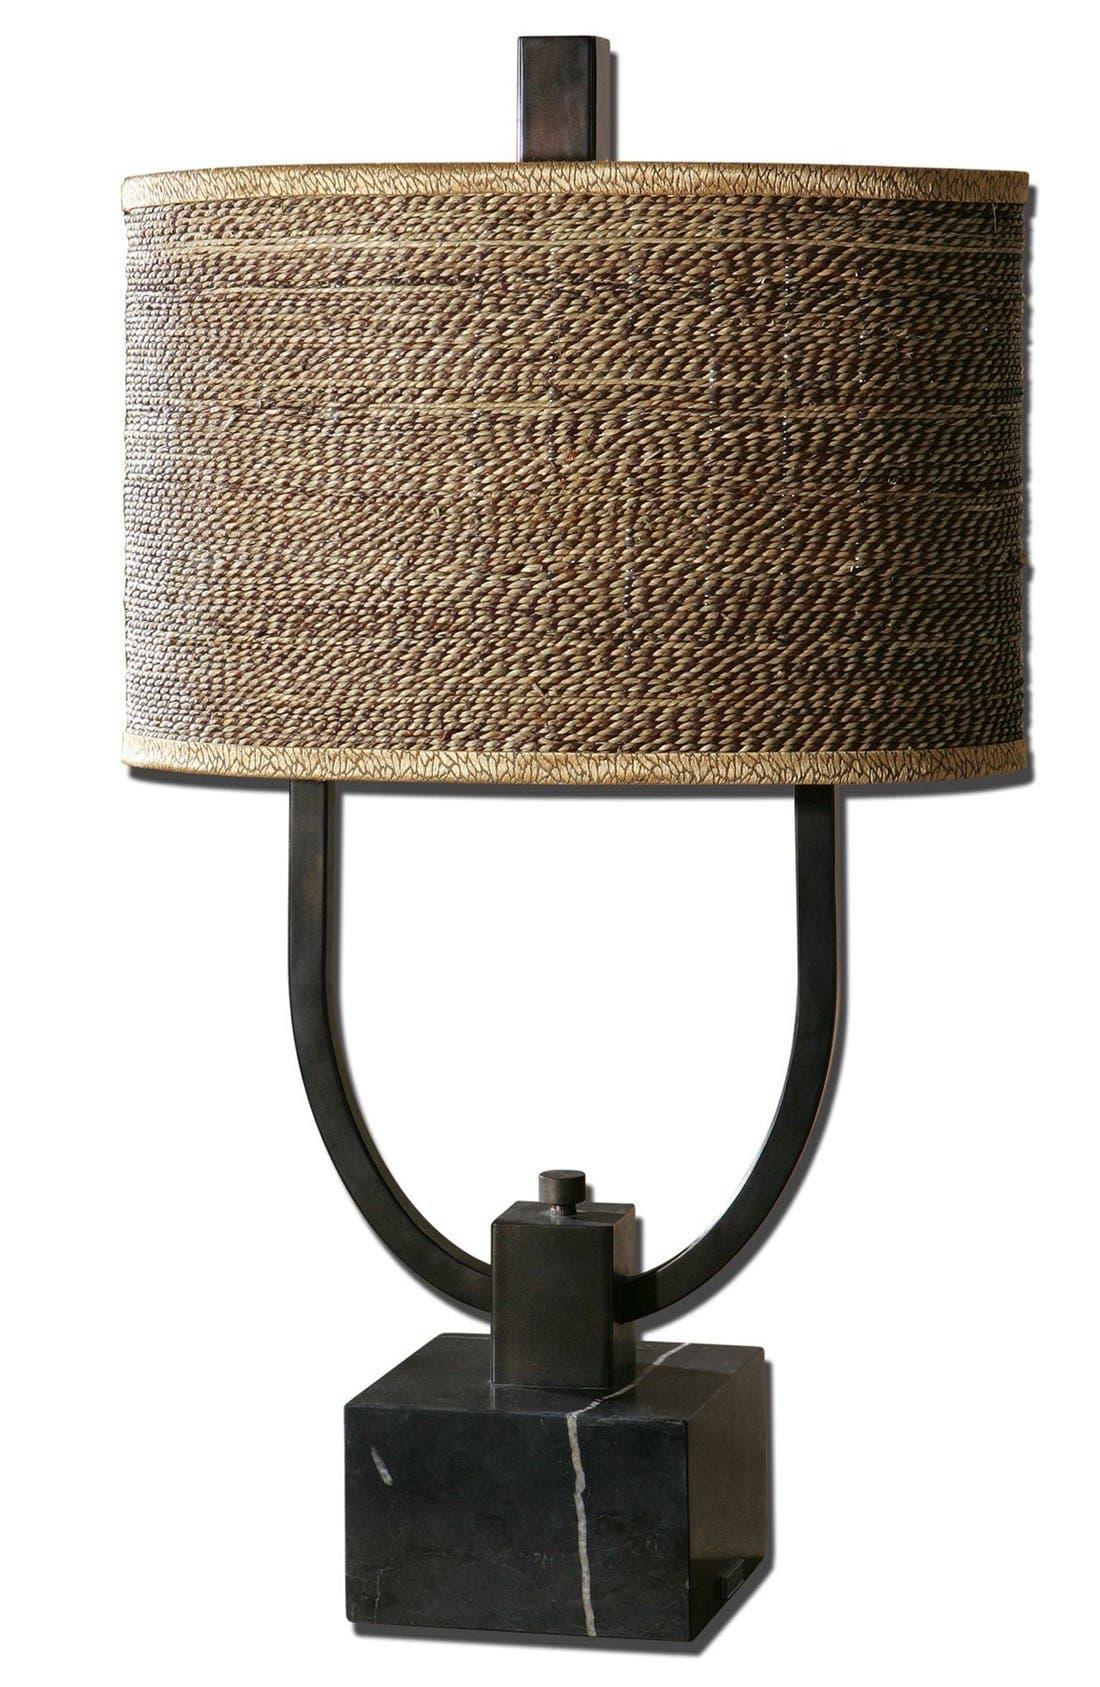 'Stabina' Metal Table Lamp,                             Main thumbnail 1, color,                             200